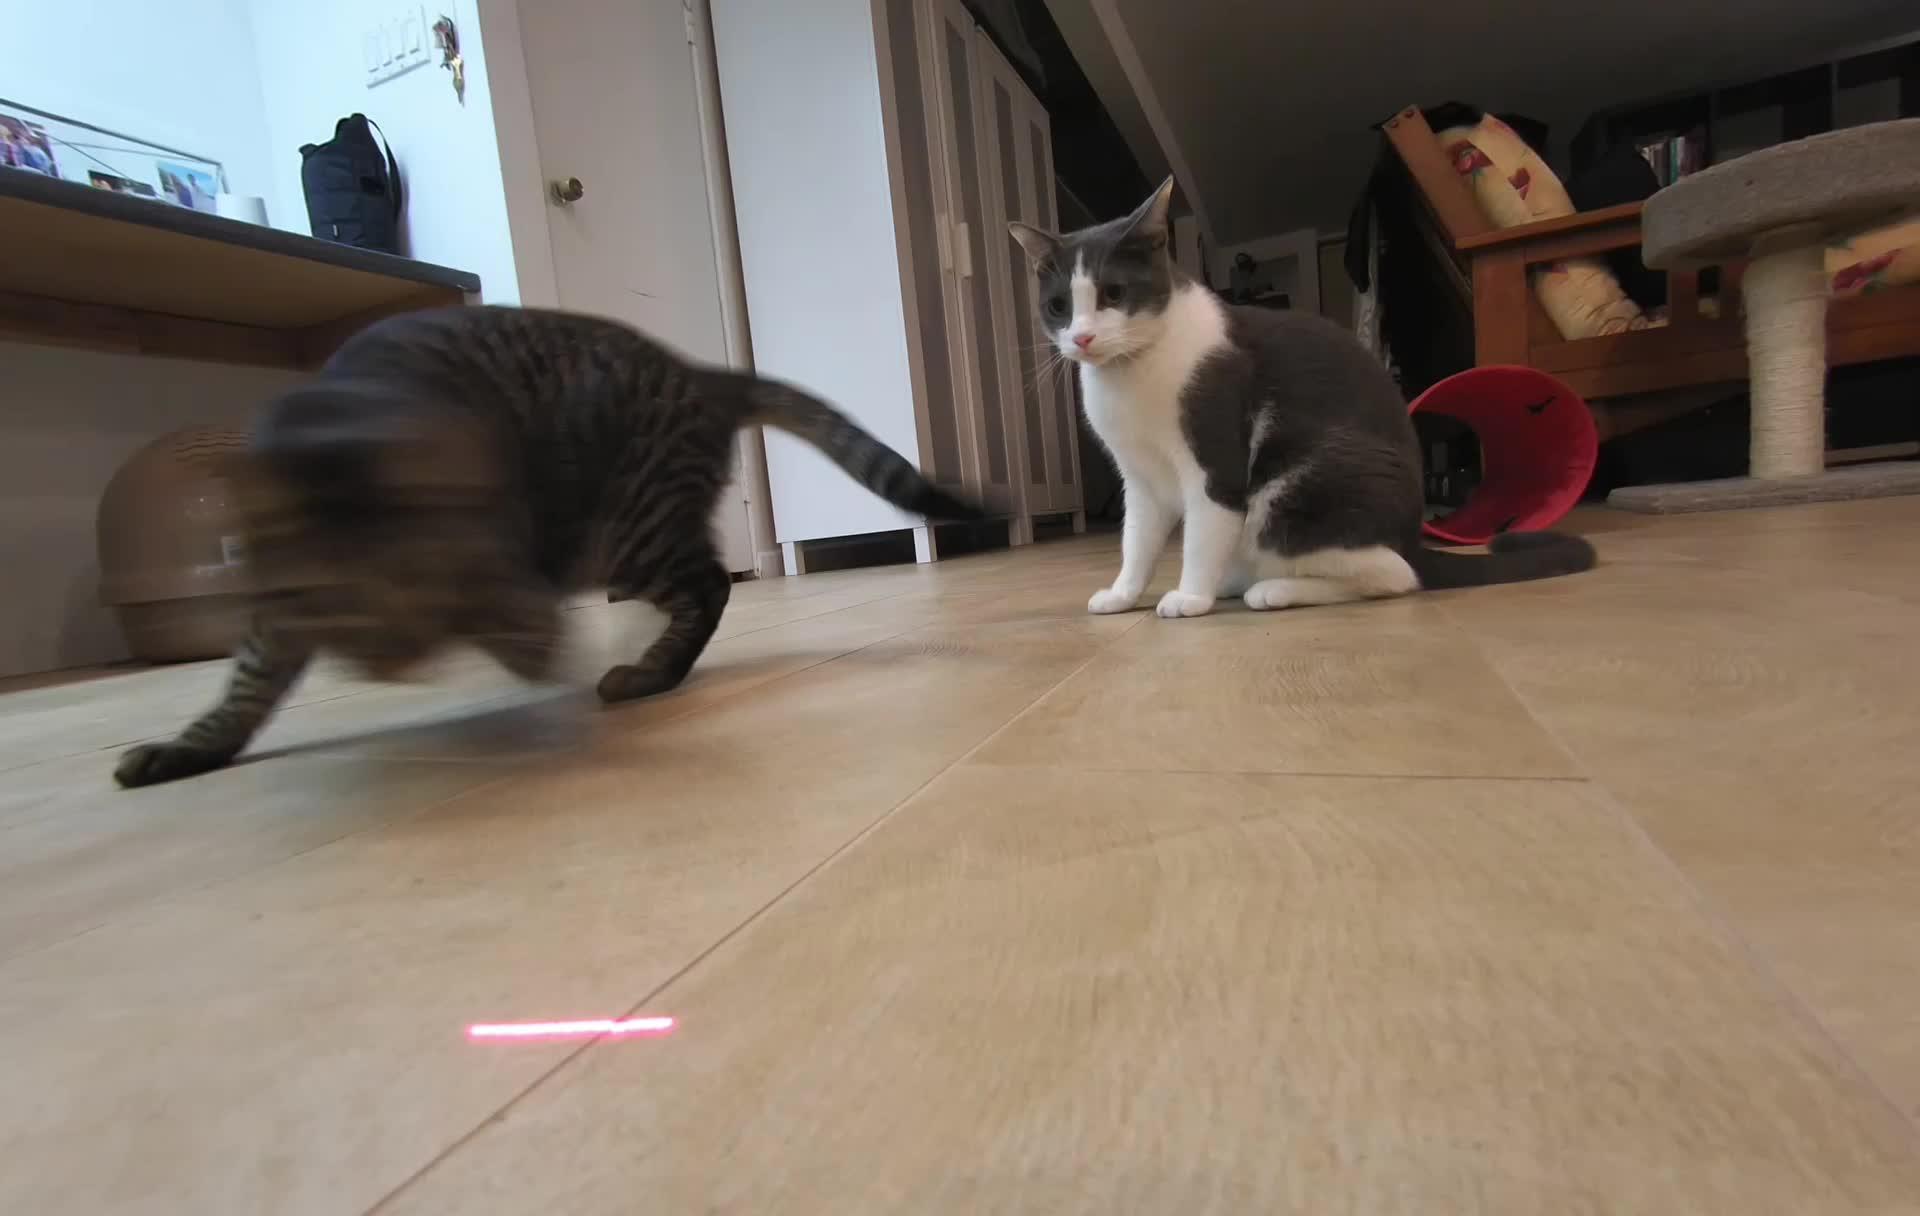 Google Clips - Laser Cat GIFs